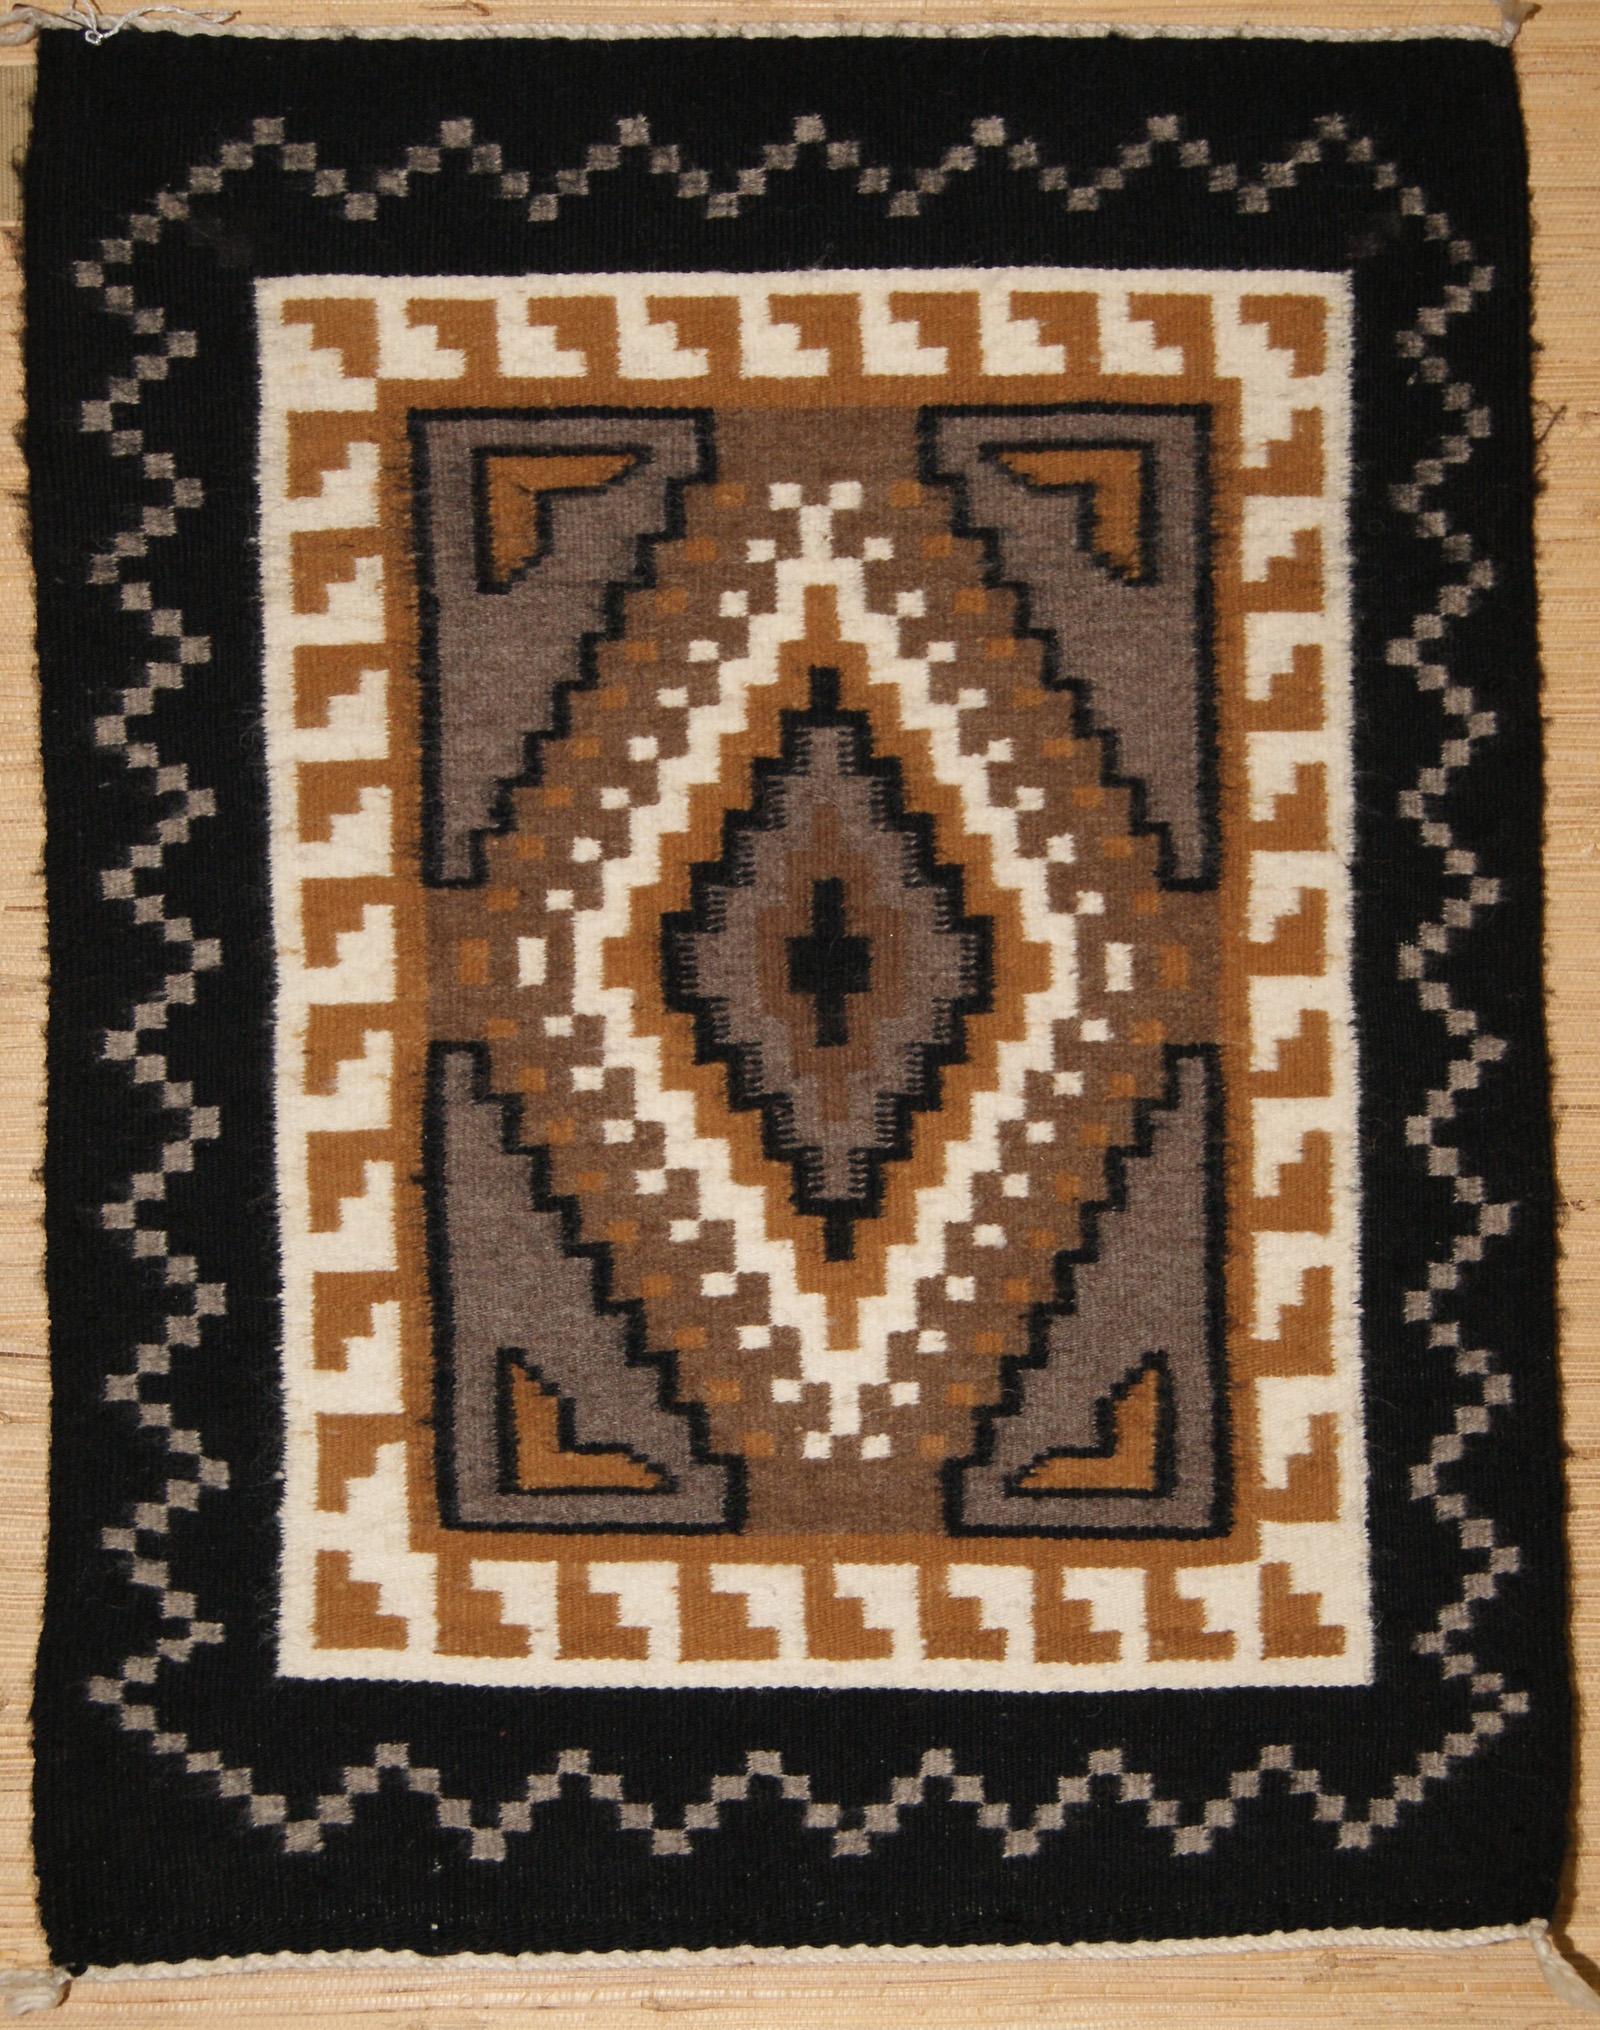 Navajo rug designs for kids Lesson Regional Navajo Rugs History Charley For Rugs Ideas Navajo Rug Designs Rugs Ideas